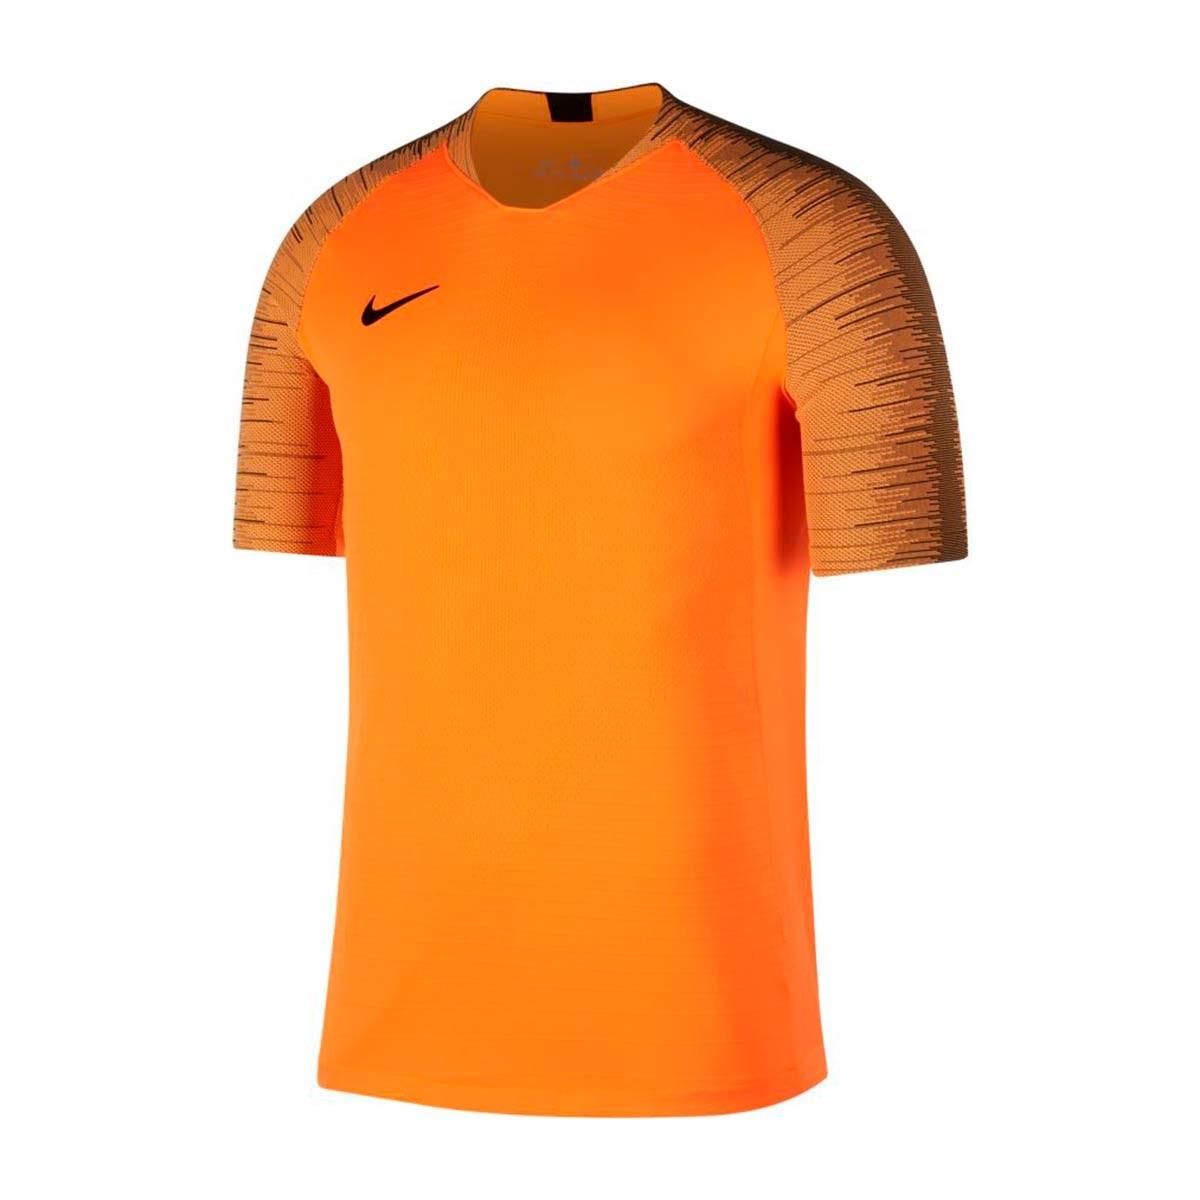 Jersey Nike Aeroswift Strike Top SS Cone-Black - Football store ... 91b4fc77a89